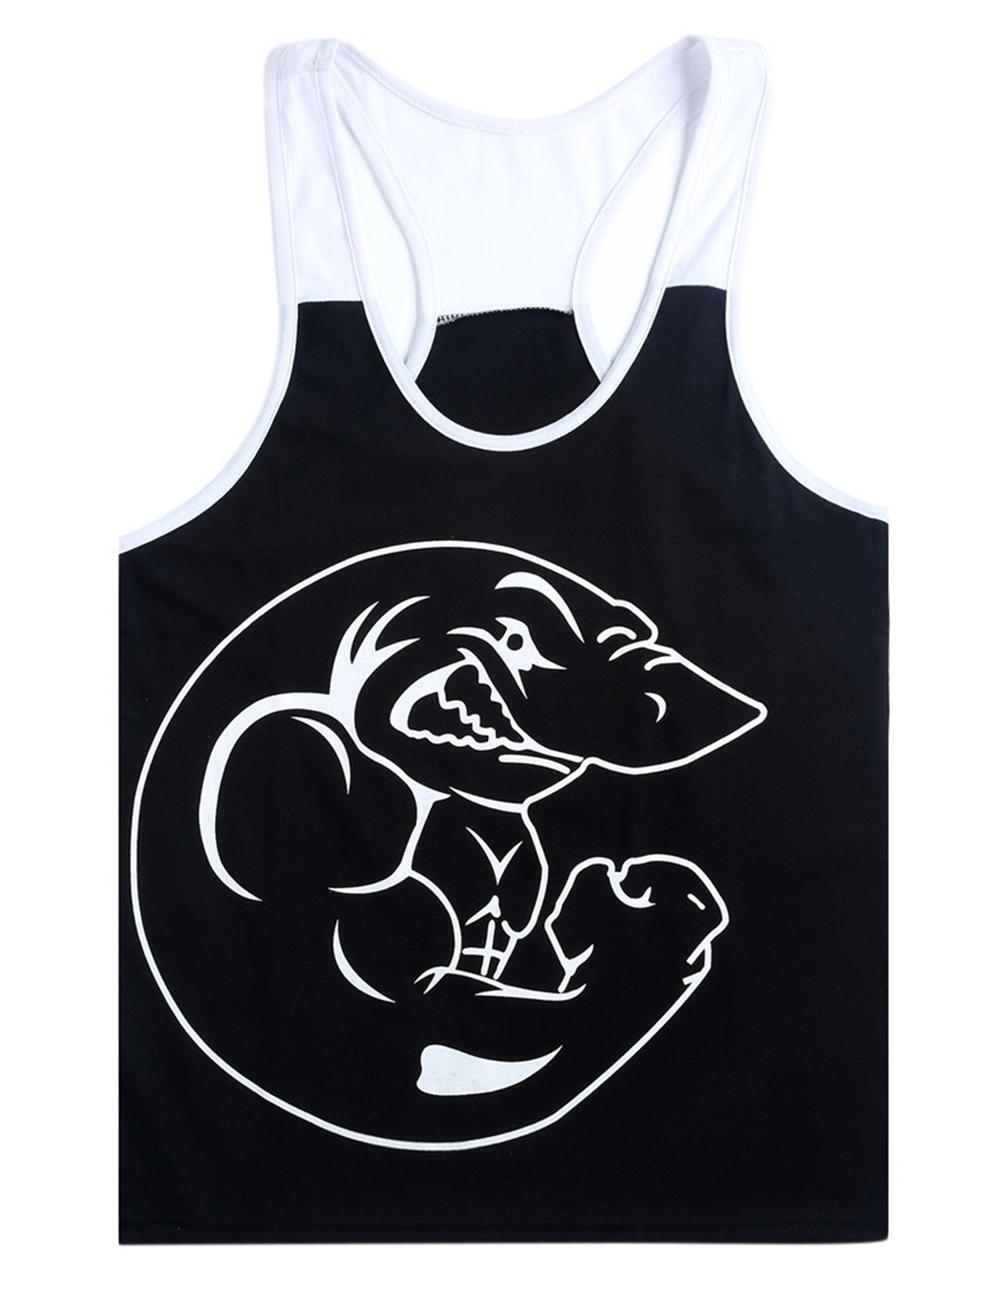 Men-Y-type-BodyBuilding-Fitness-Tank-Top-Shark-Print-Training-Exercise-Slim-Vest